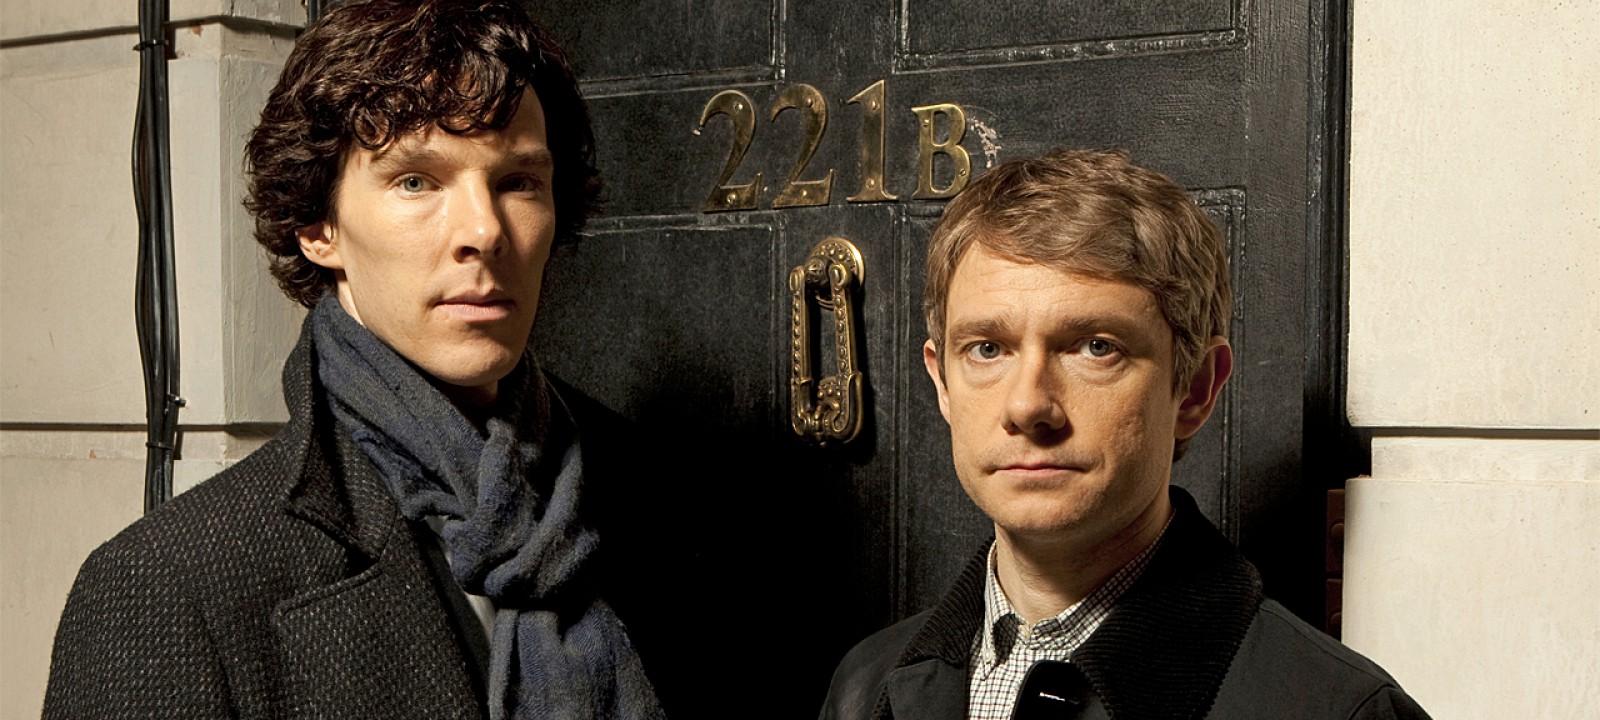 Benedict Cumberbatch and Martin Freeman in 'Sherlock' (Photo: BBC)